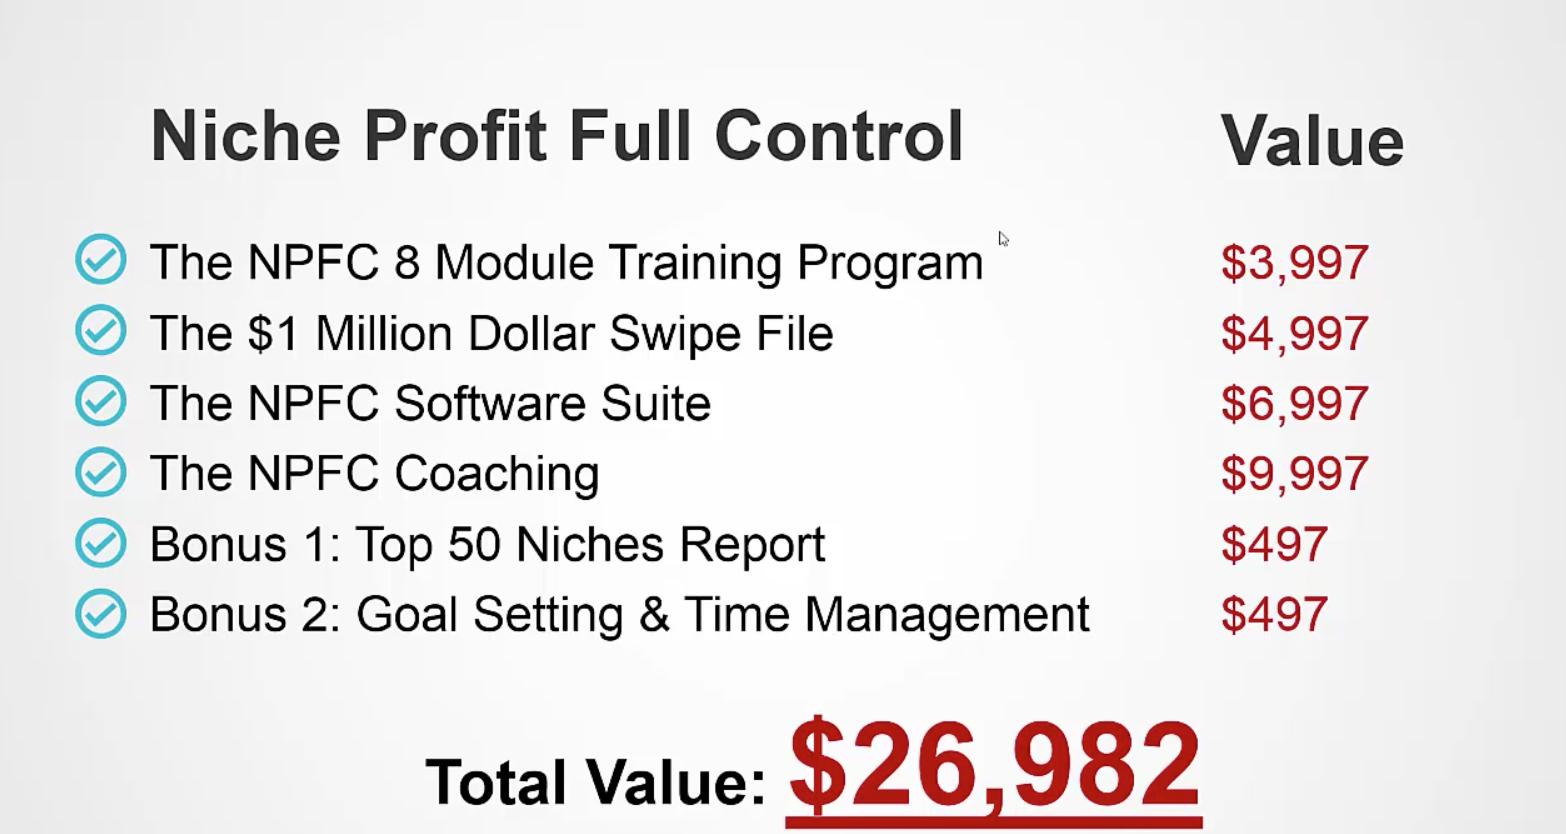 Niche Profit Classroom Promotions